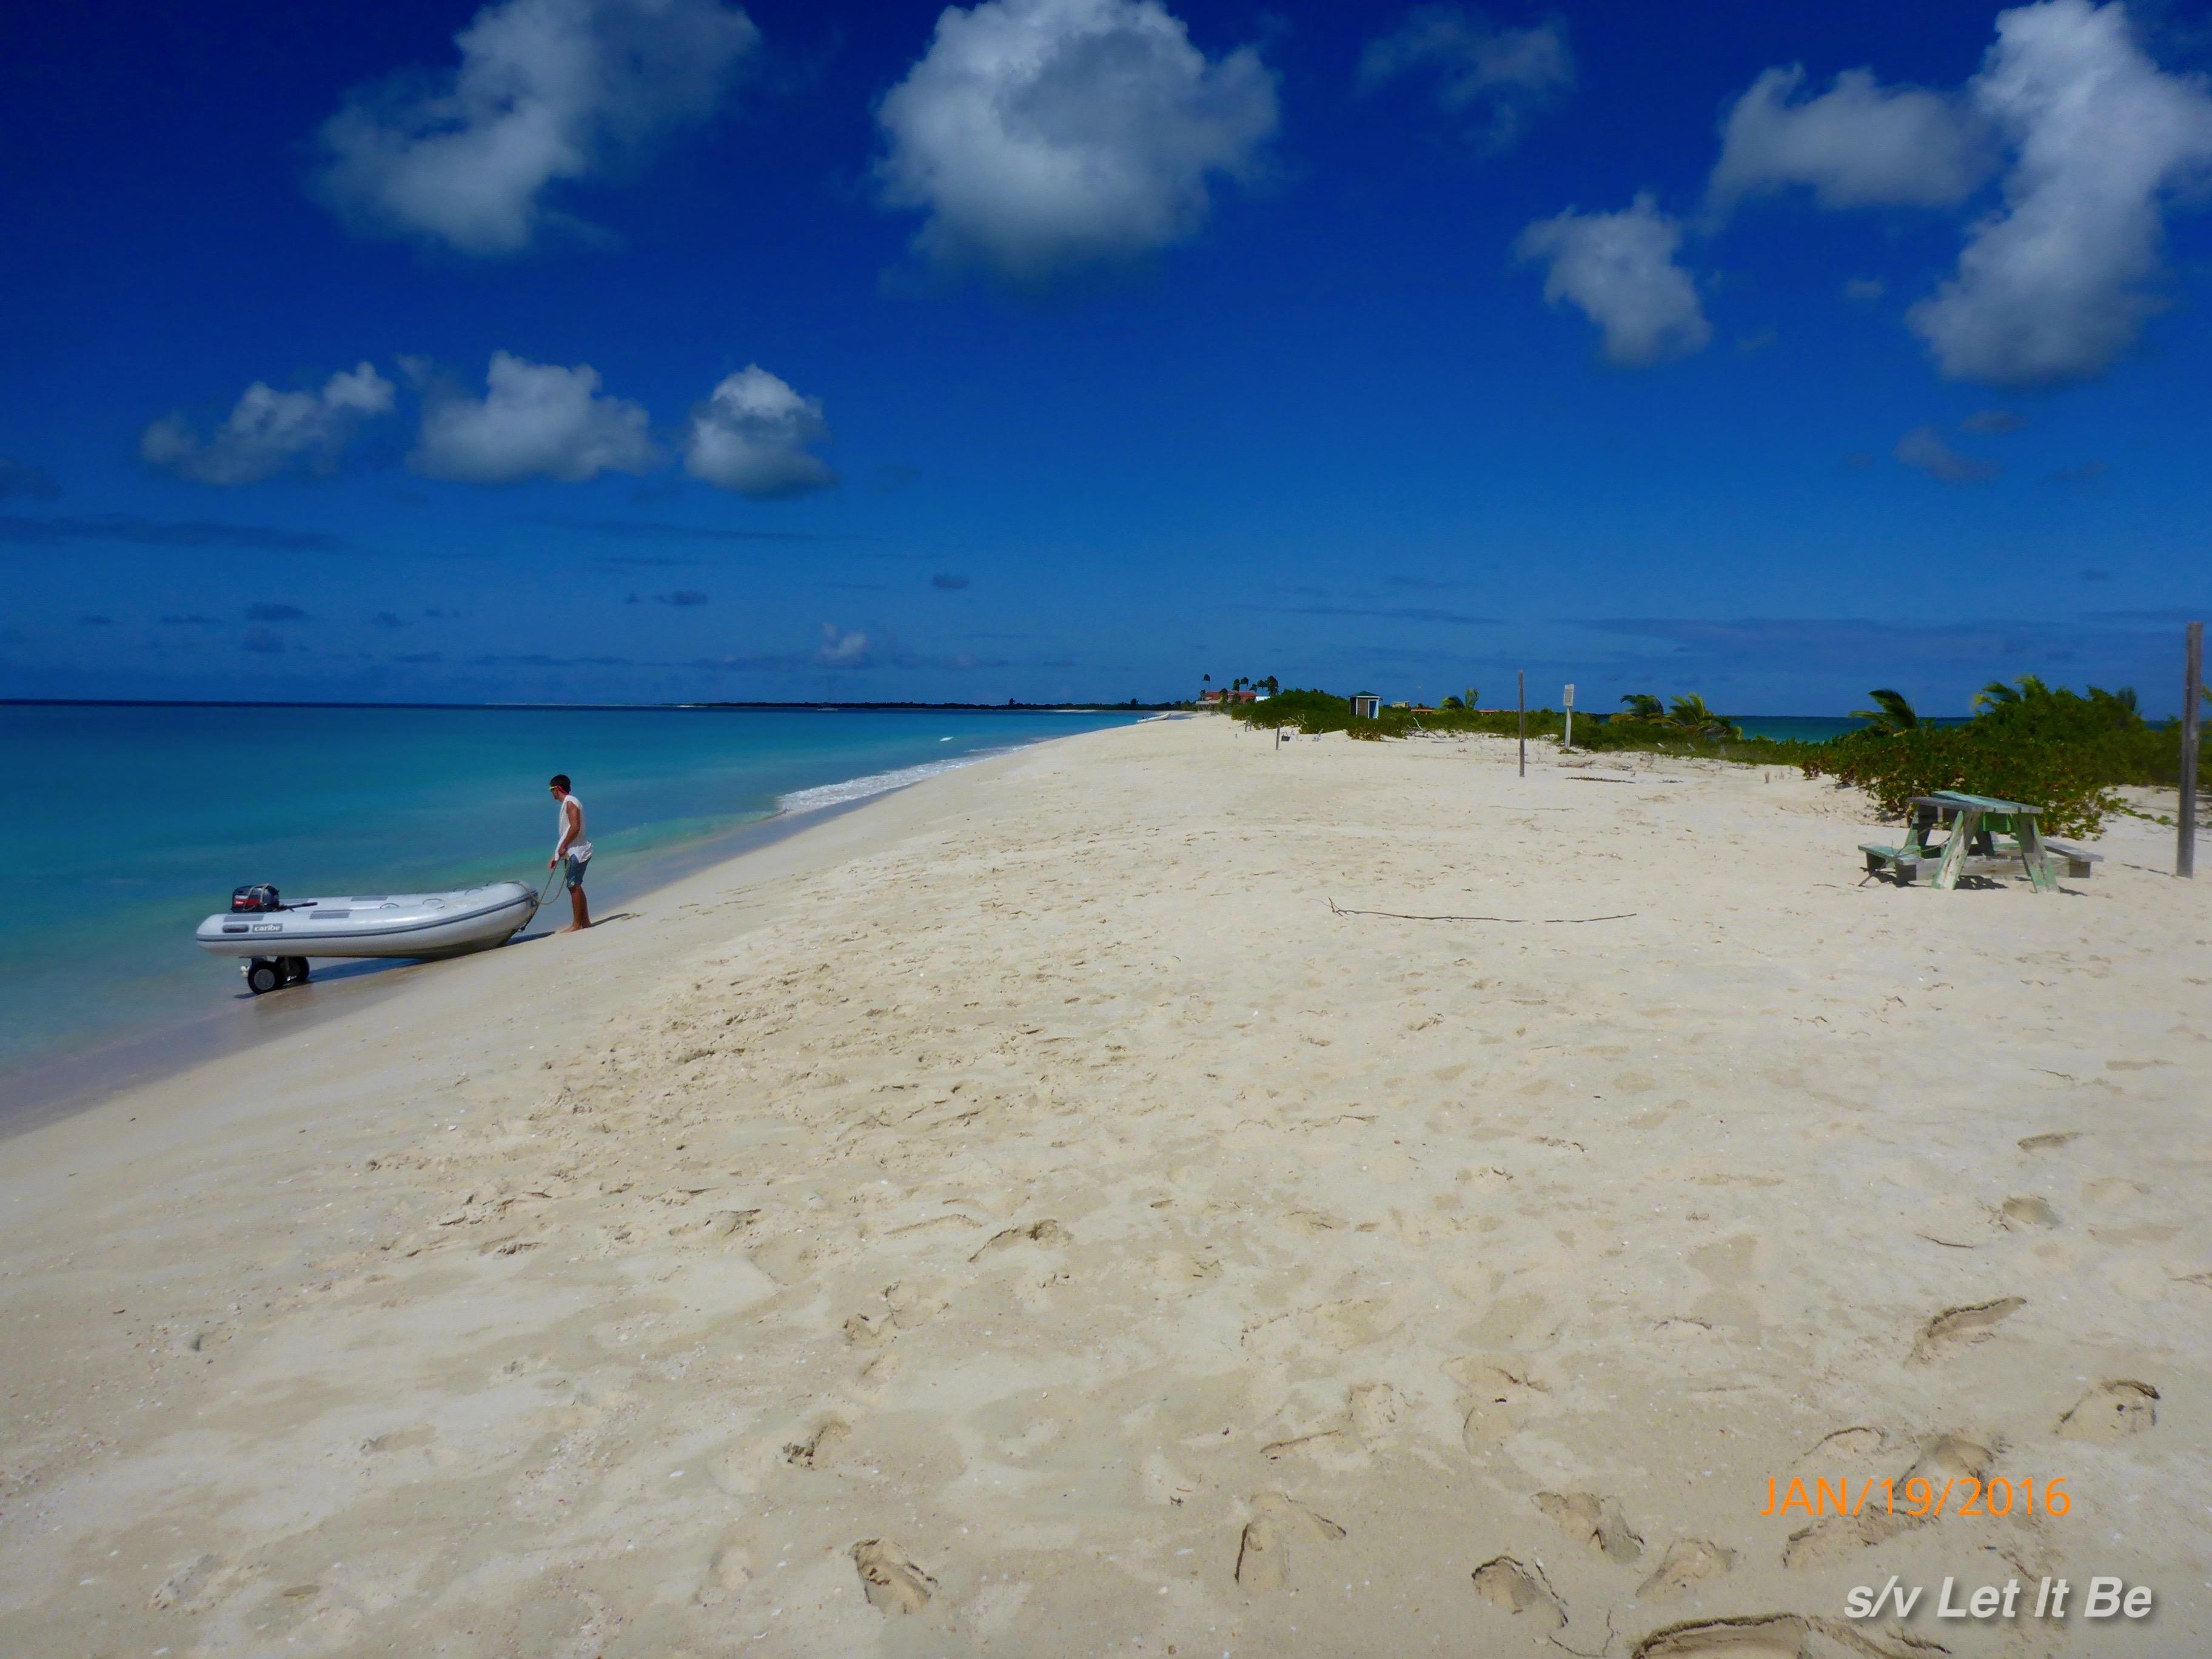 H on beach.jpg